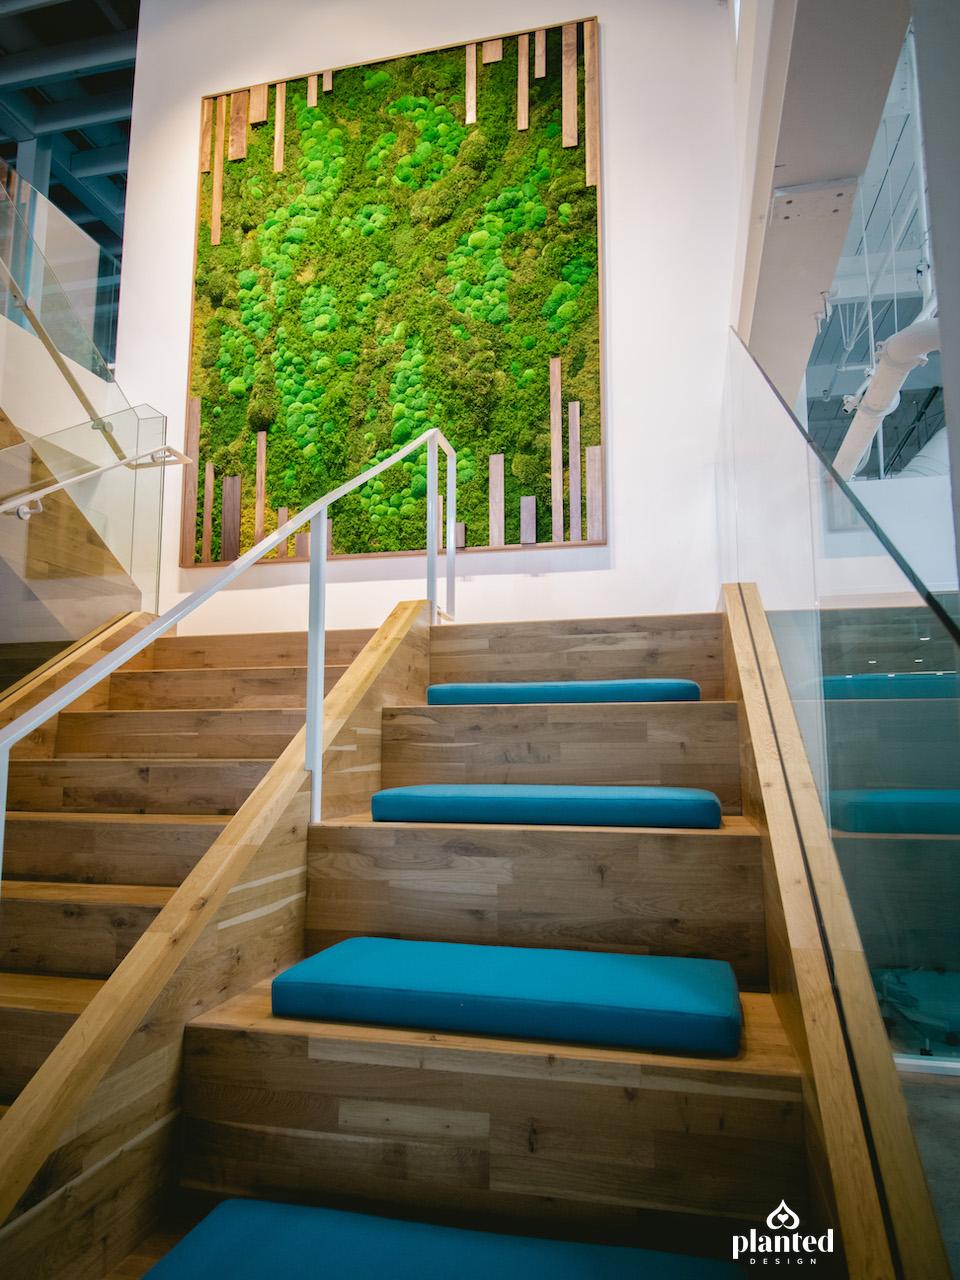 PlantedDesign_MossWall_PerfectDayFoods_Emeryville_California_Office-10_fixed.jpg